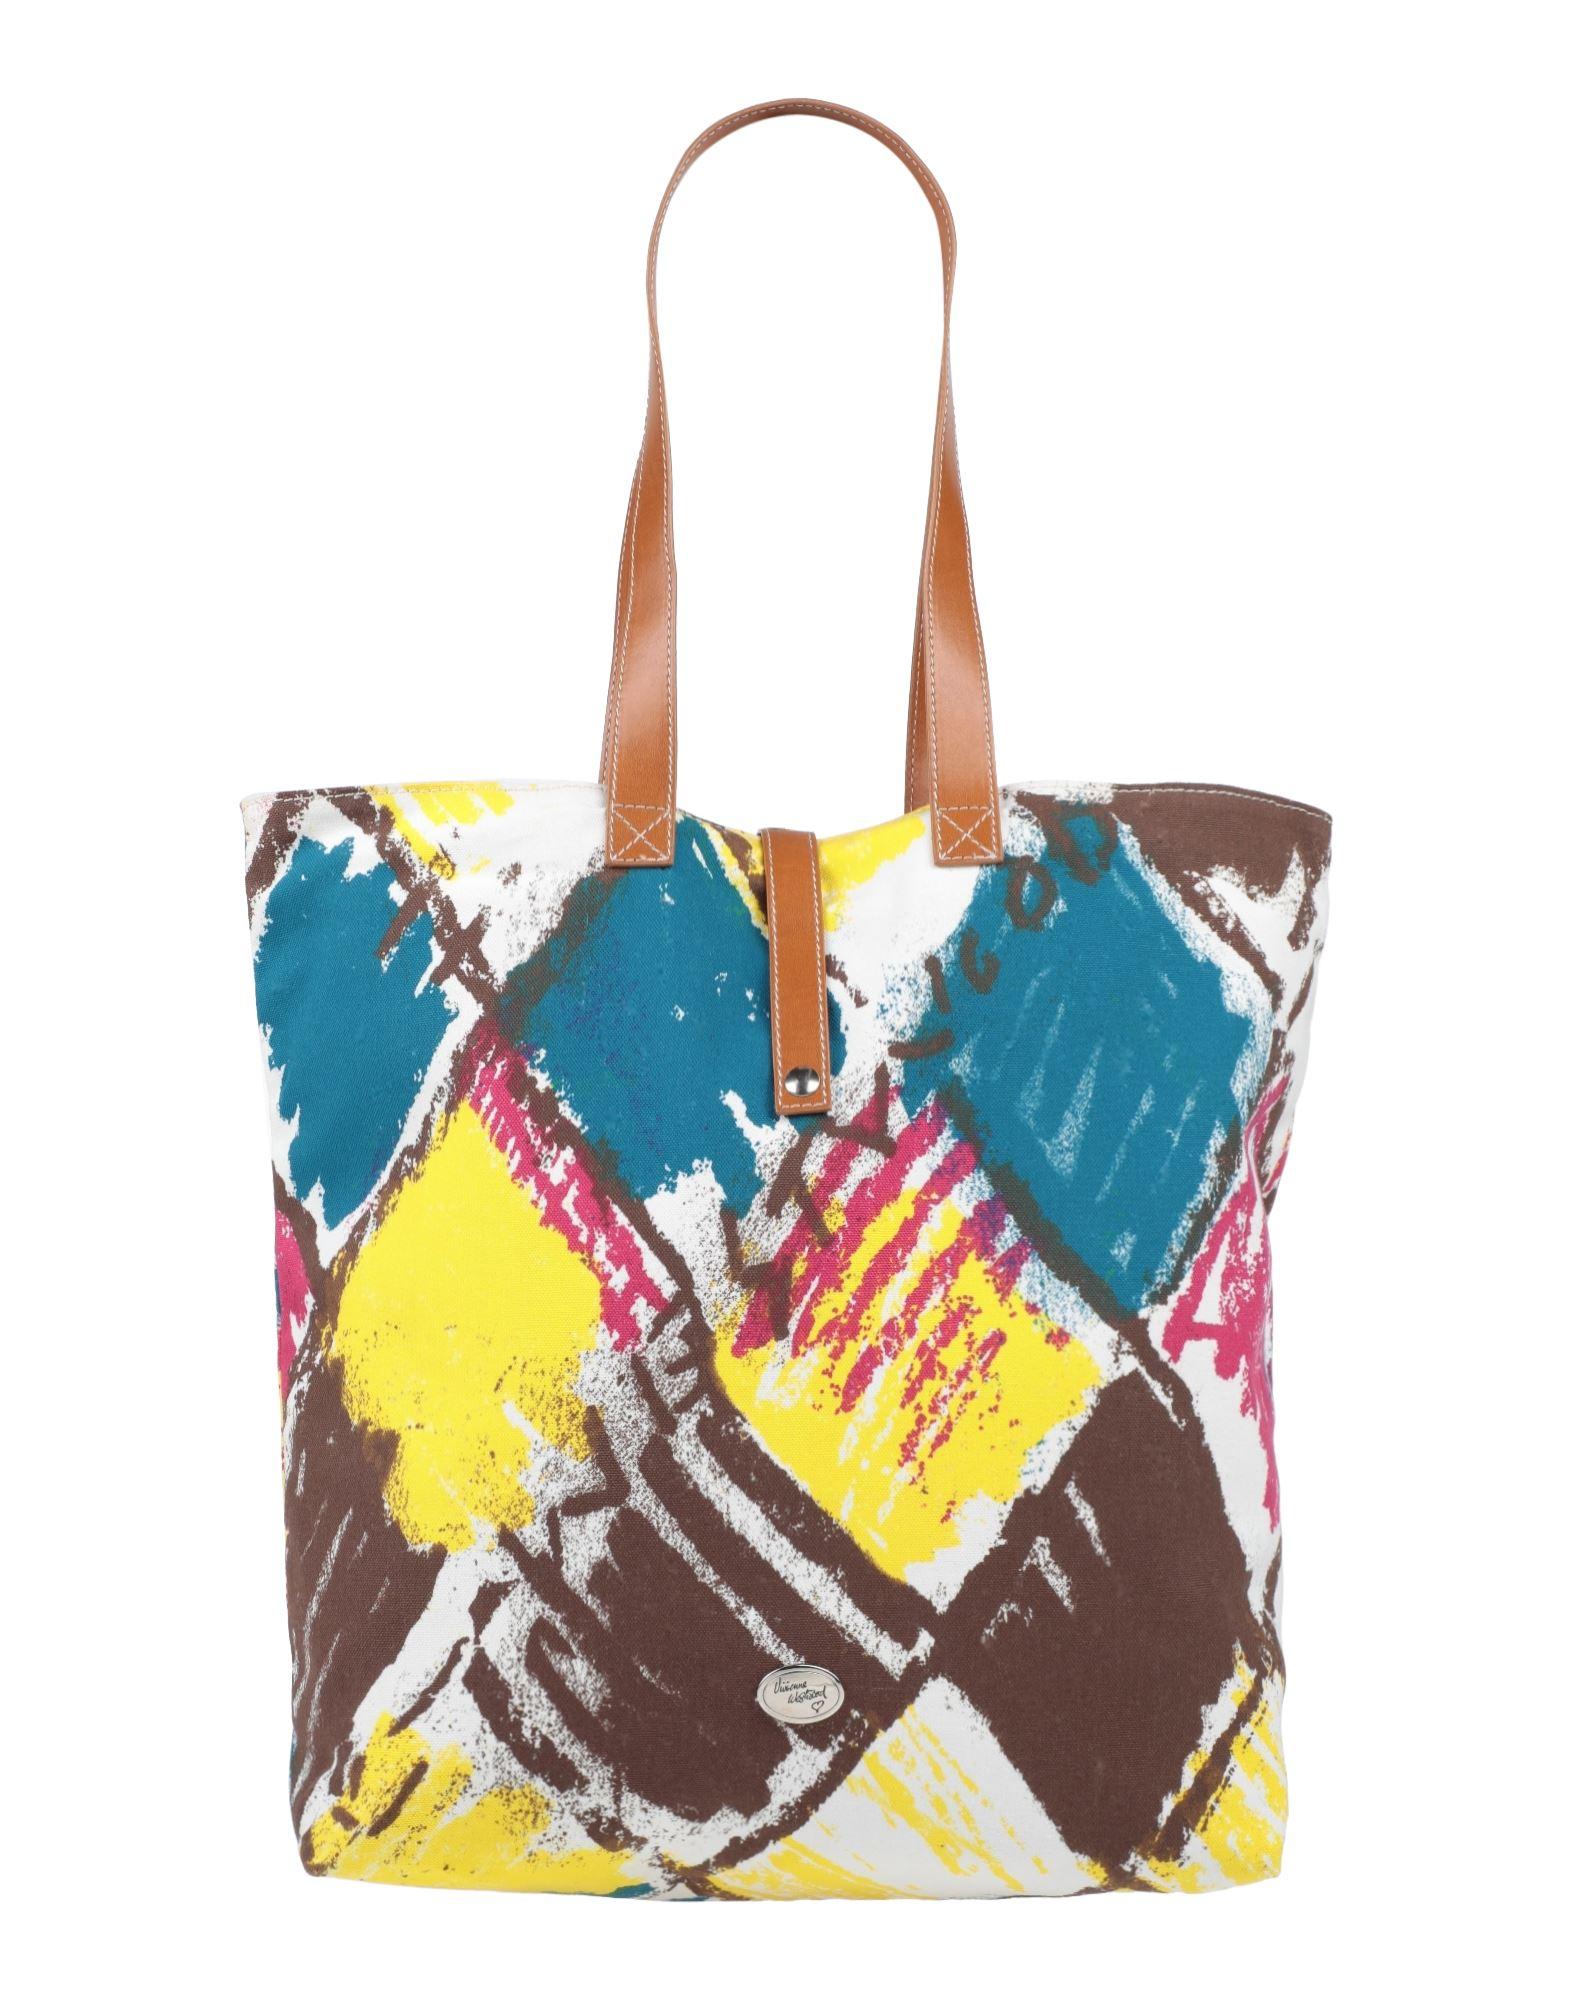 VIVIENNE WESTWOOD Shoulder bags - Item 45564206